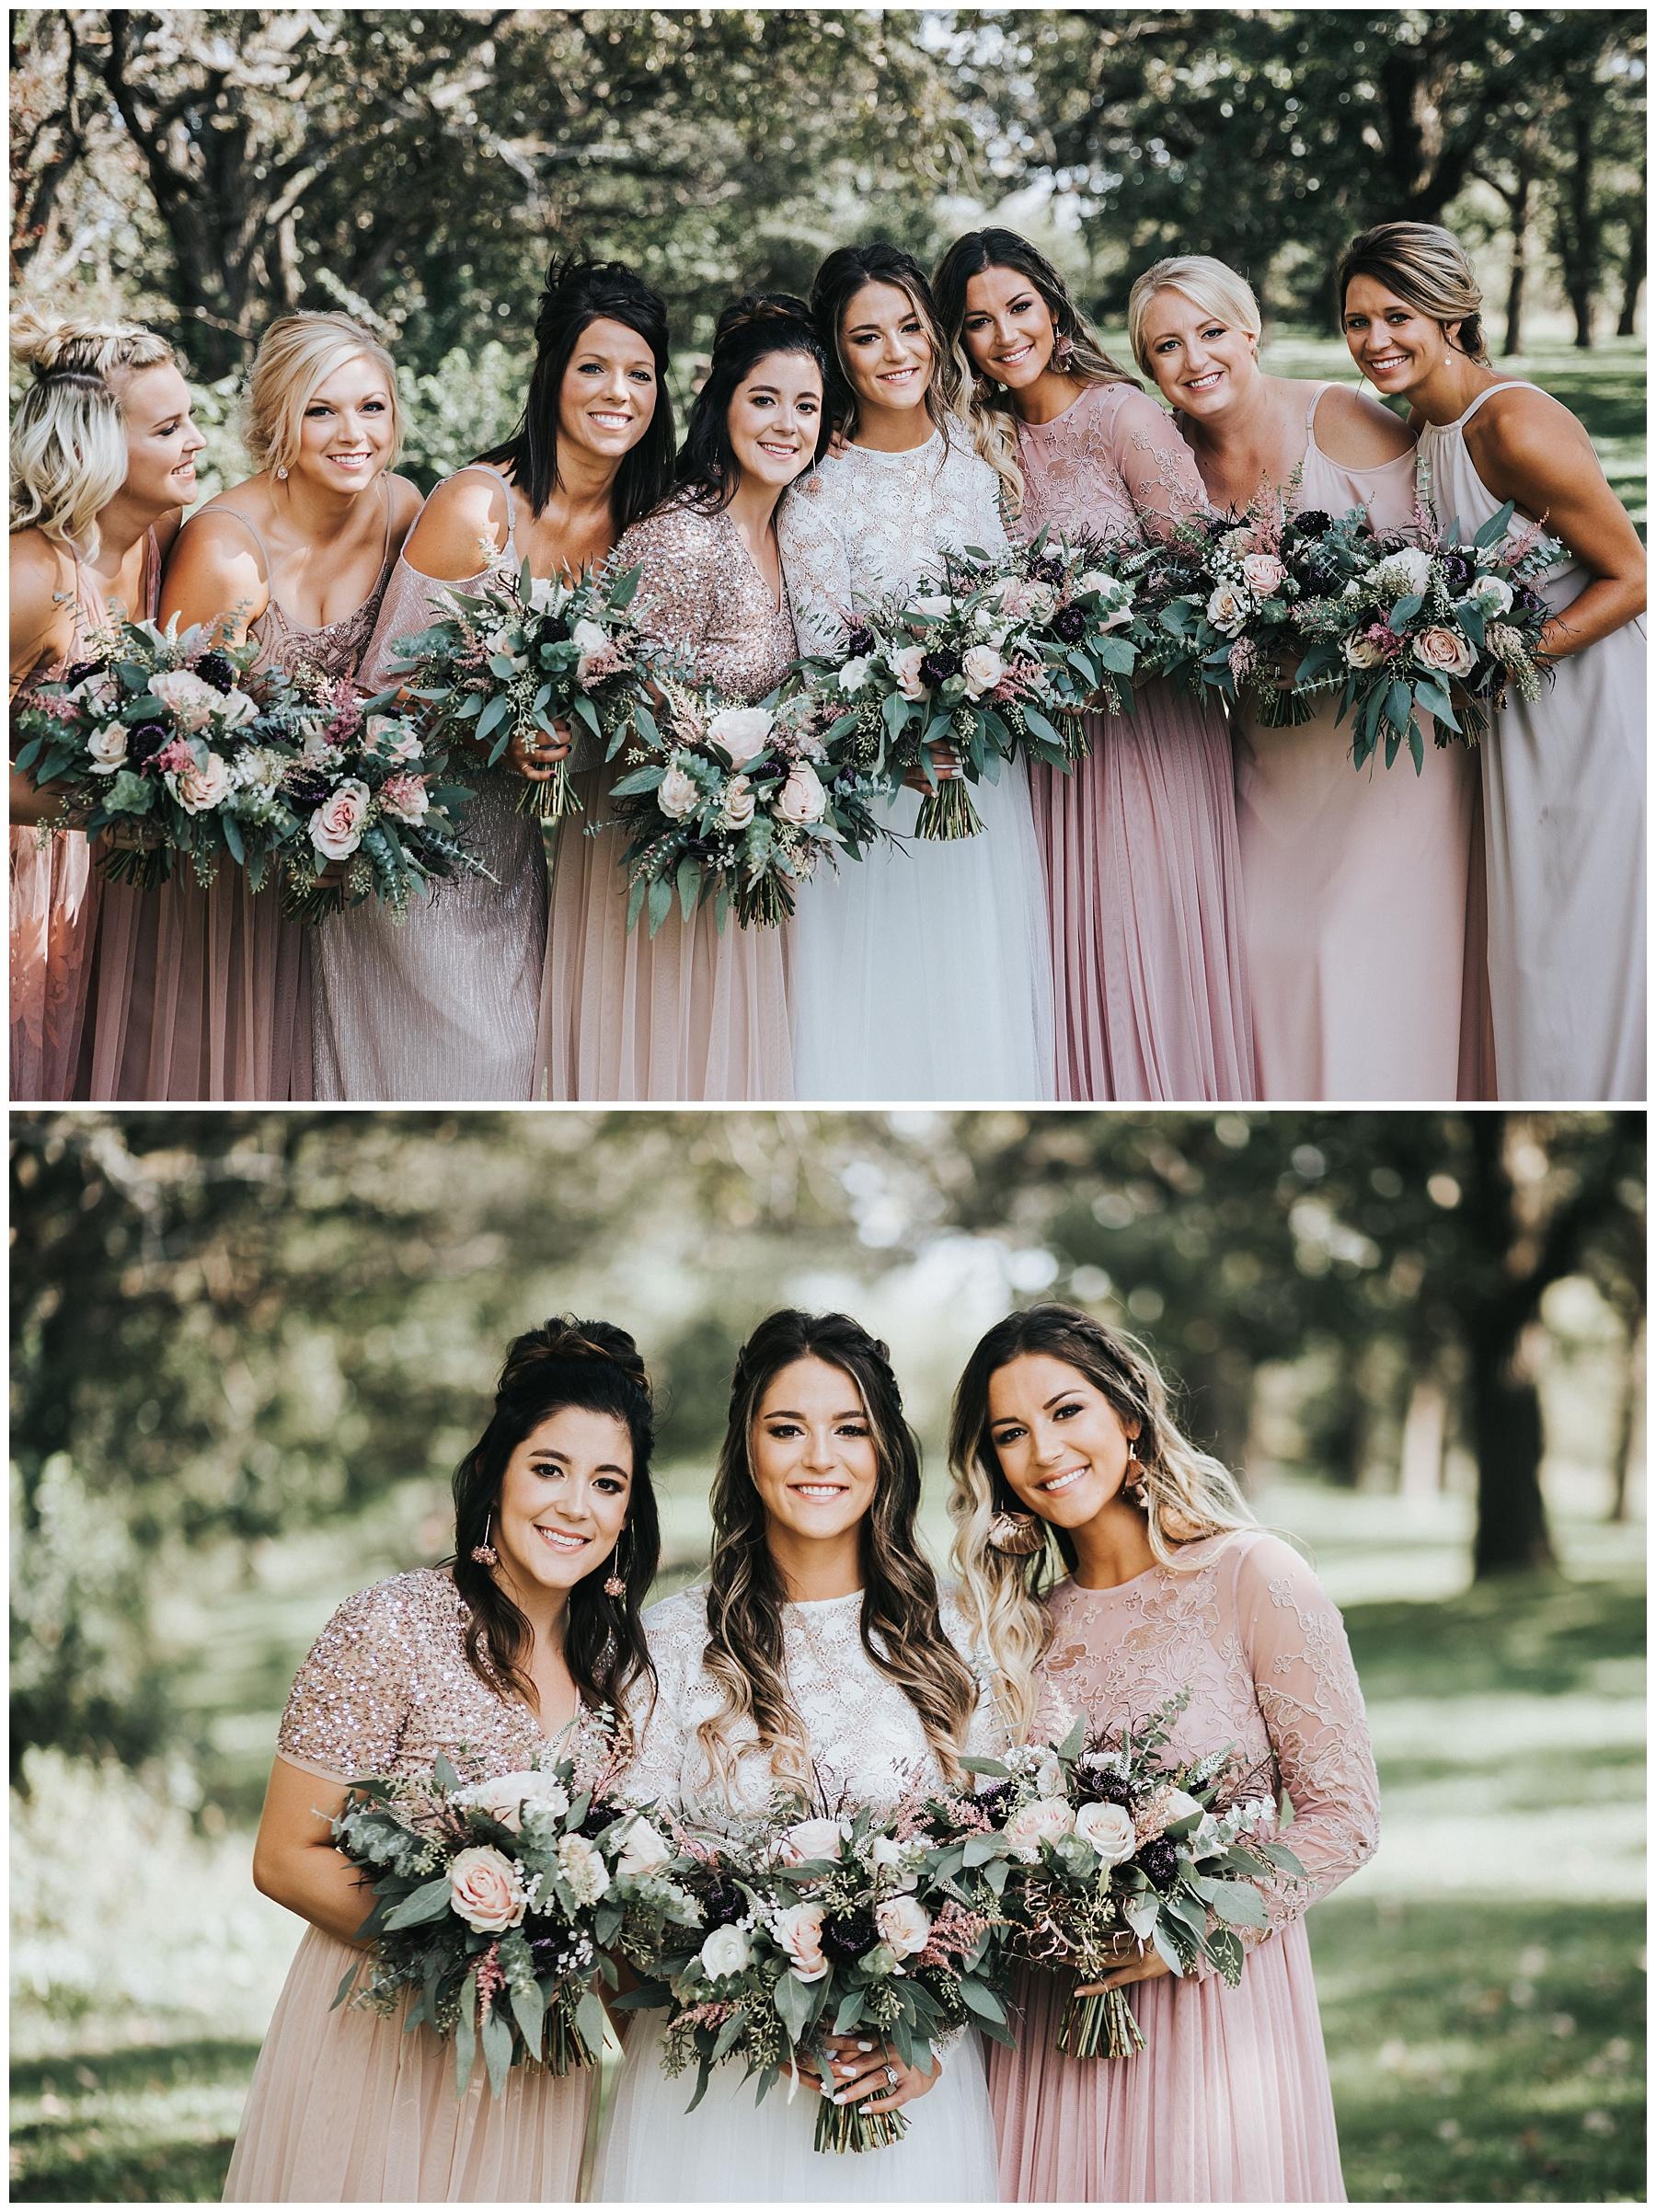 Stunning bride and bridesmaids!